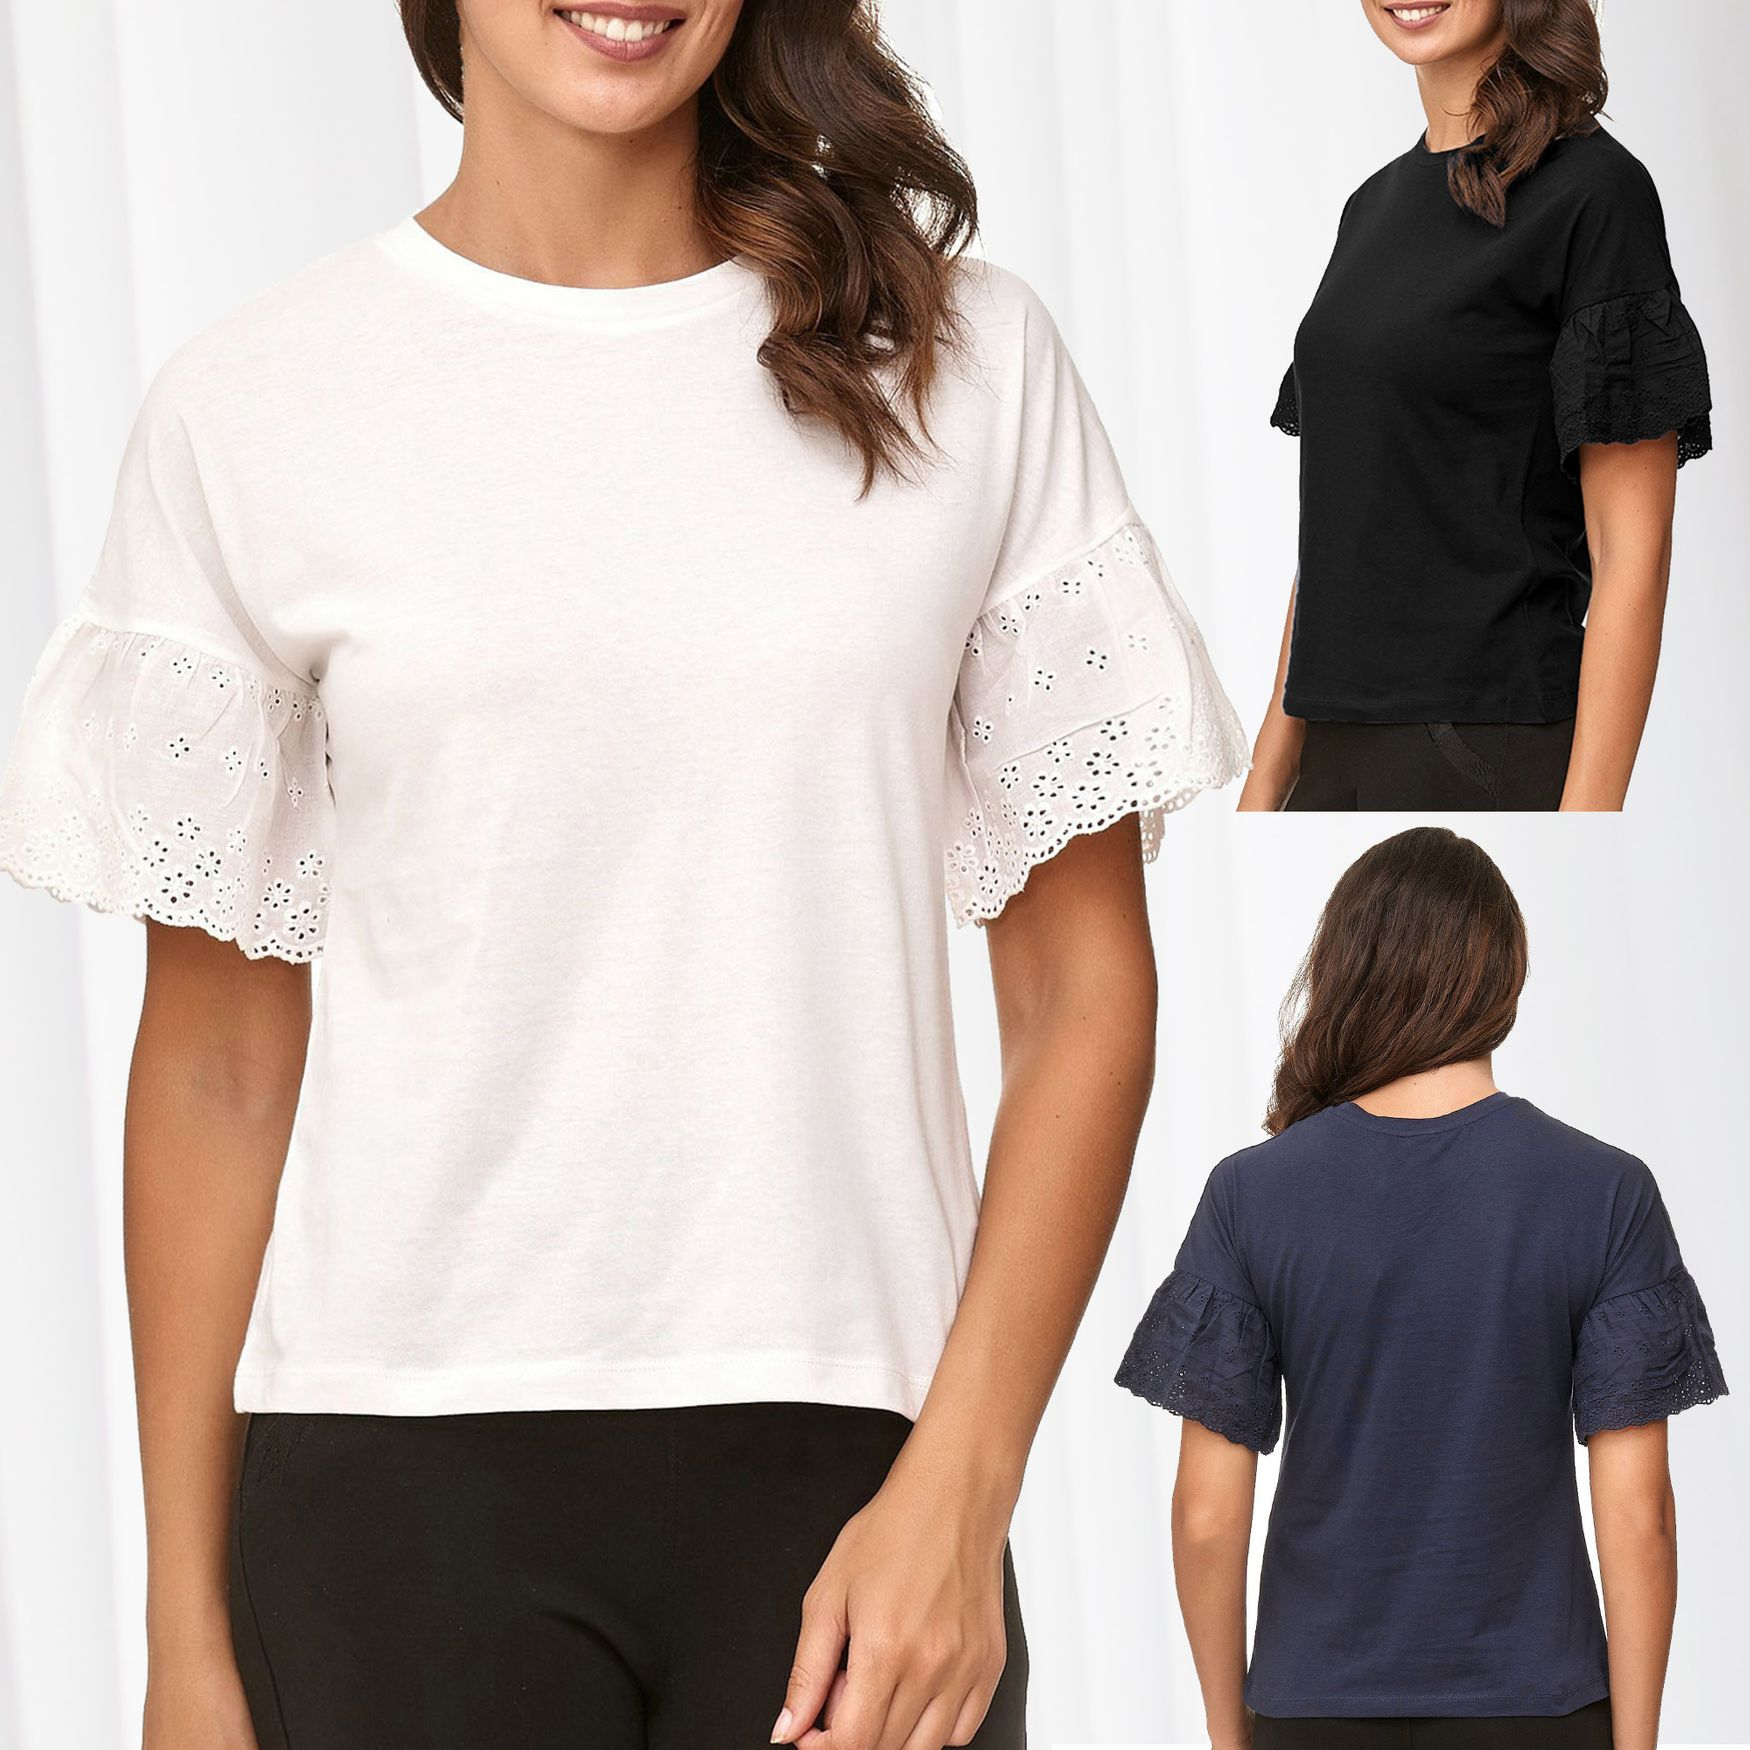 JDY Damen T-Shirt Kurzarm Jacqueline de Yong Trompetenärmel Bluse Volants Ärmel